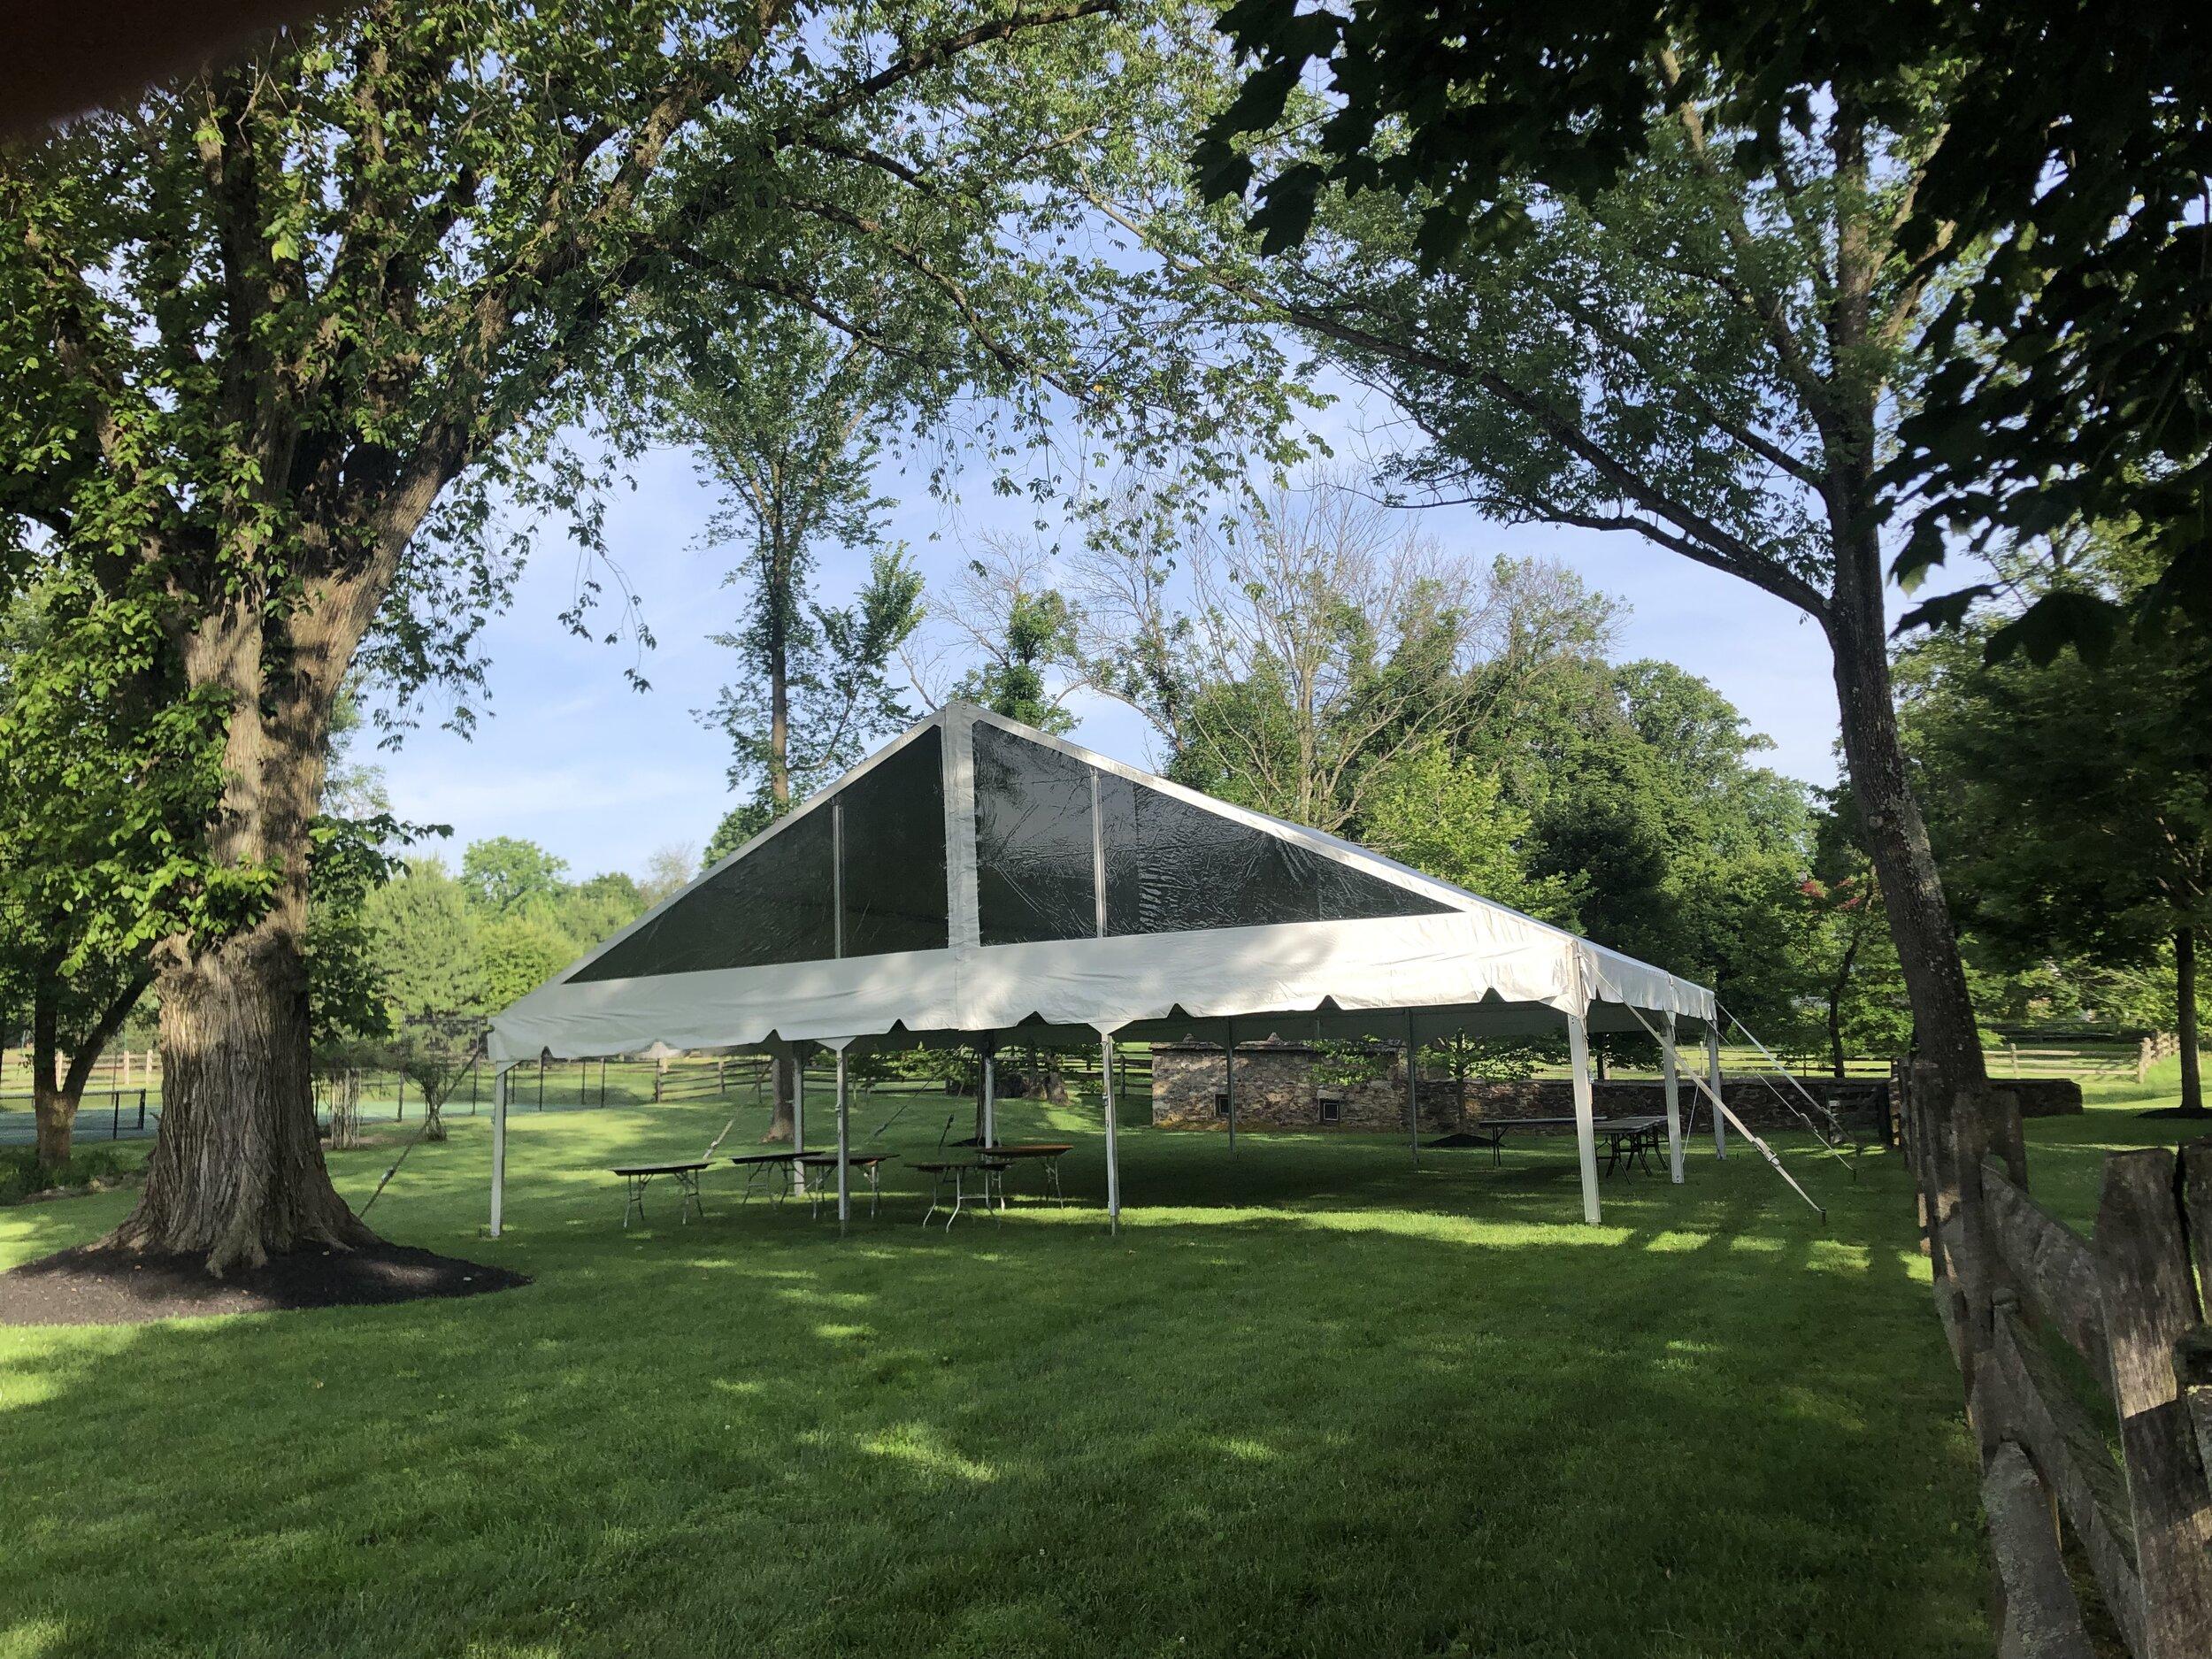 Professional tent management service